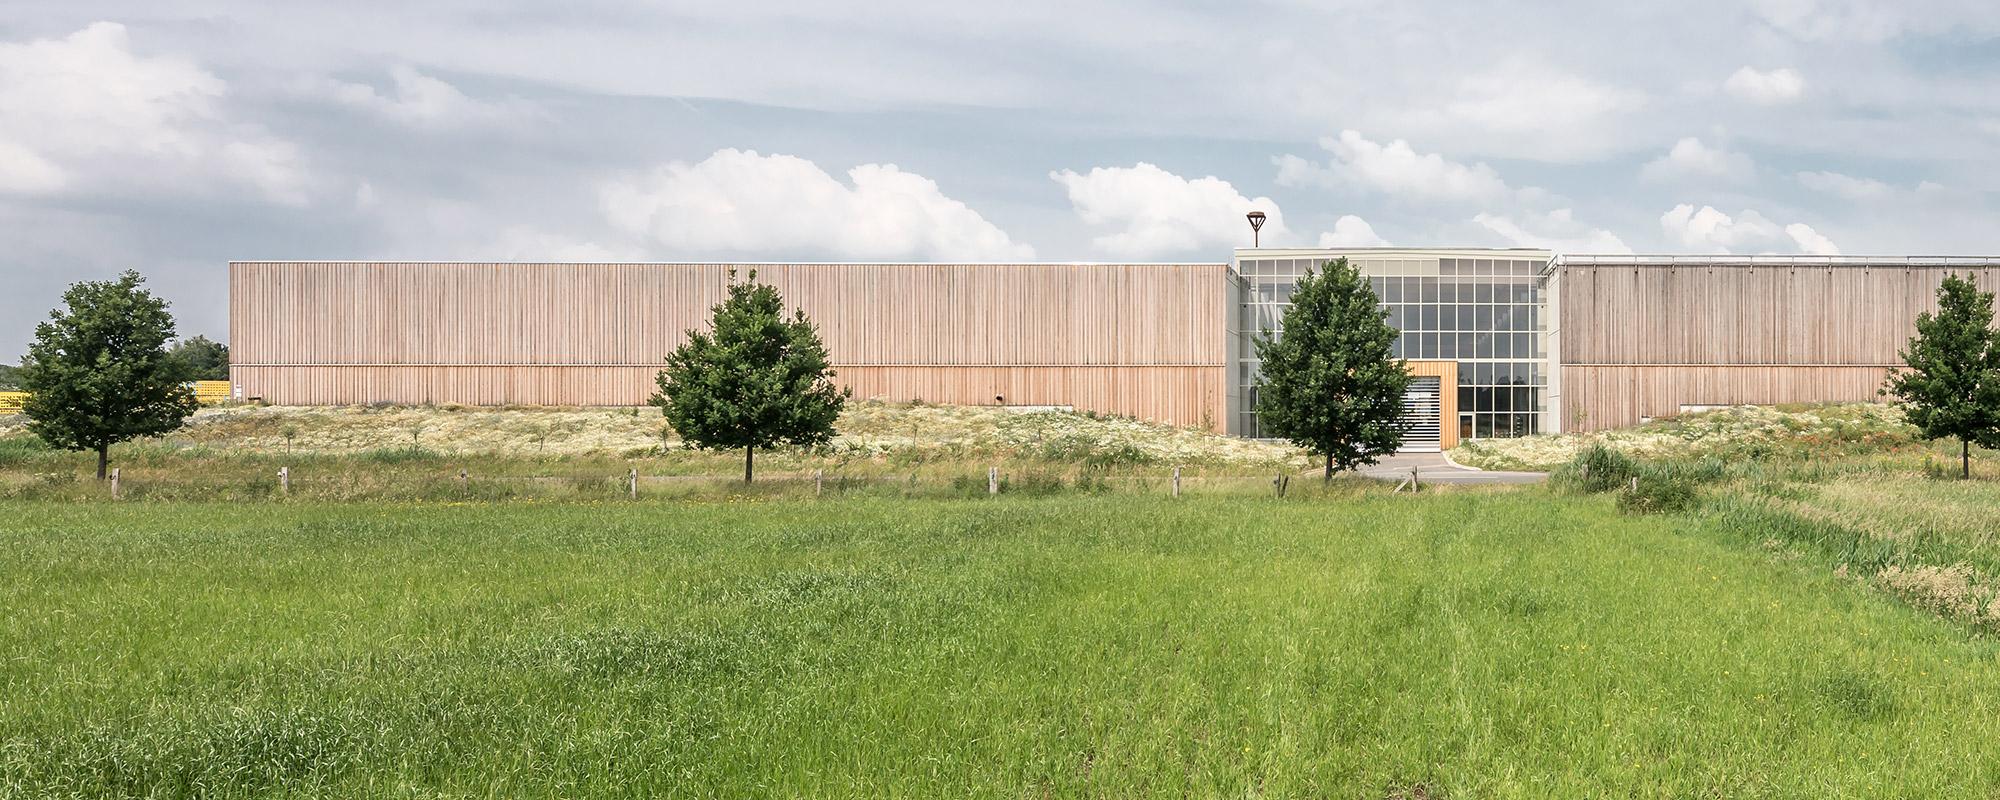 Objektbau in Holzrahmenbauweise, Referenz Karl Hoffmeister GmbH